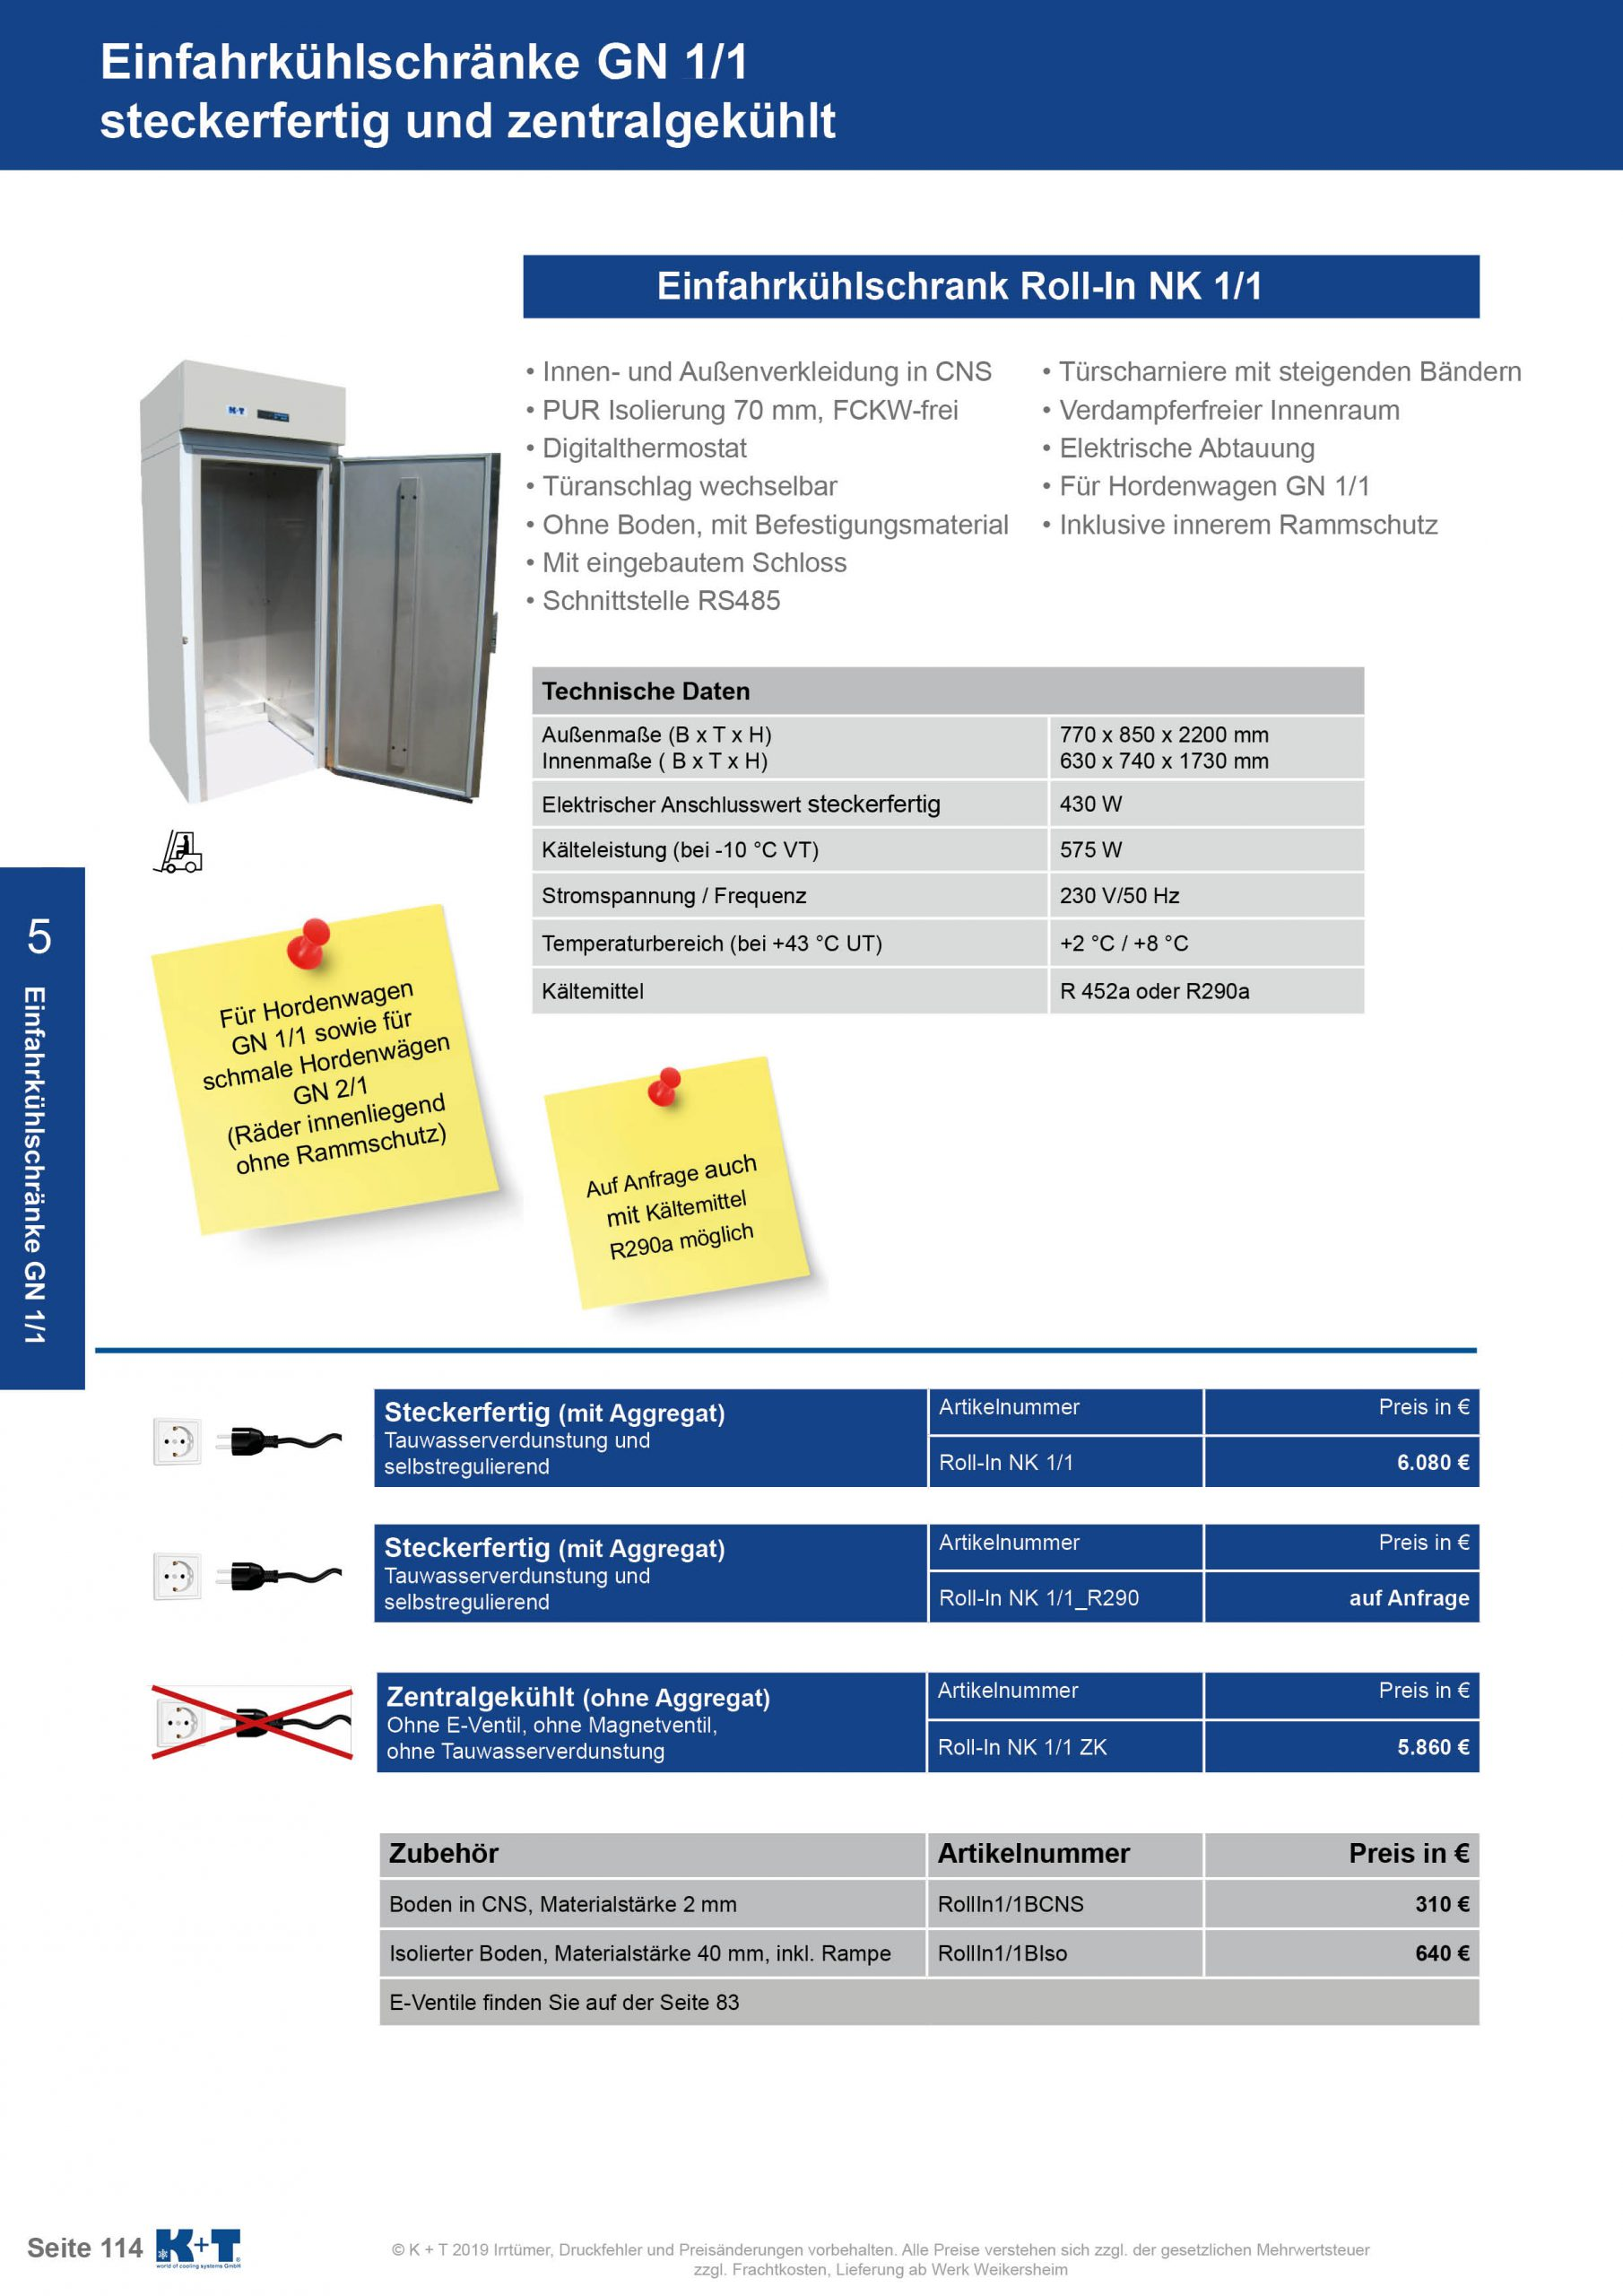 Einfahrkühlschrank GN 1_1 steckerfertig